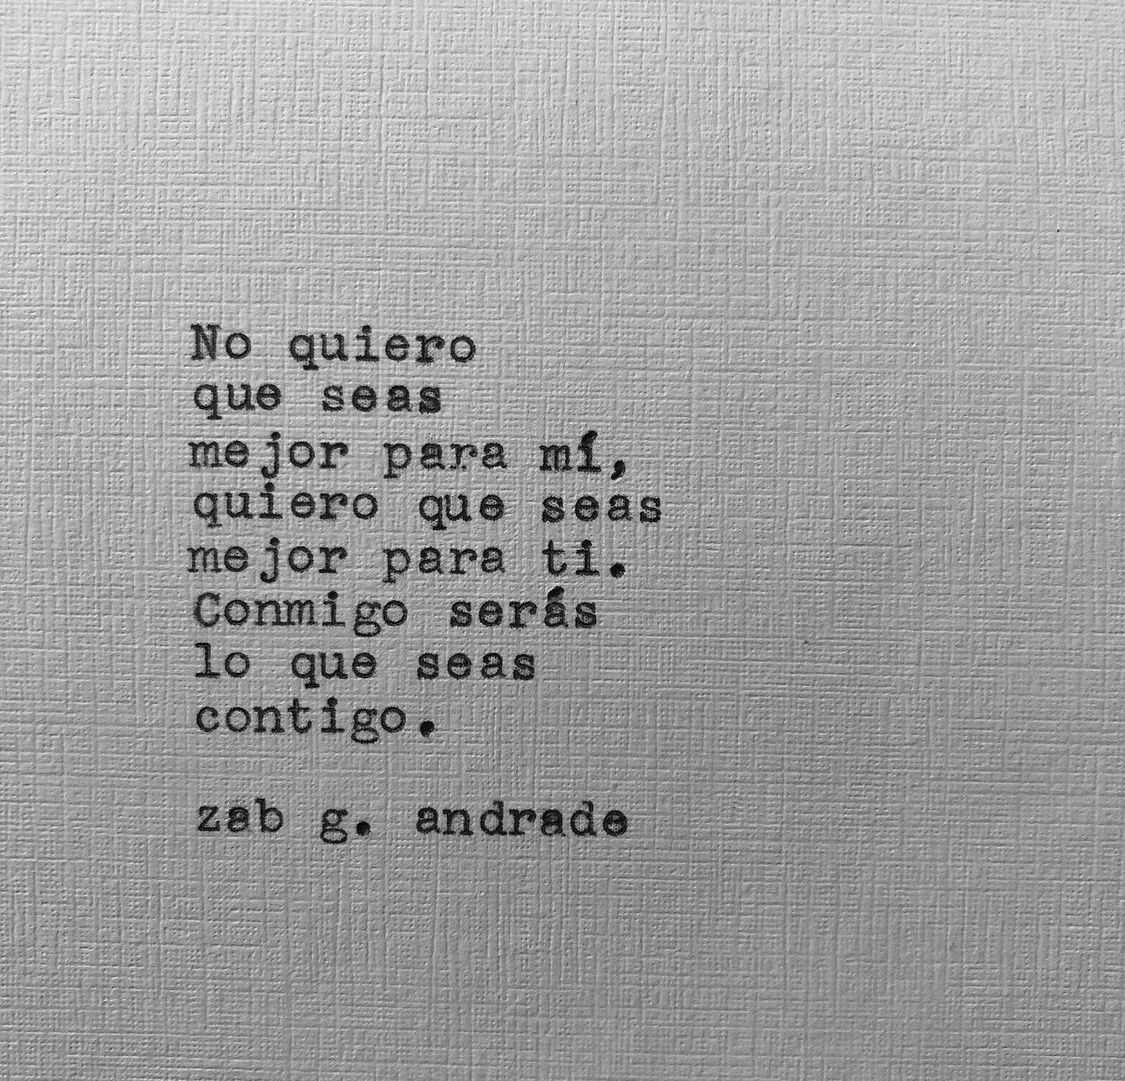 #quotes #quoteoftheday #frases #instagram #aesthetic #amor #lovequote #poem #poesia